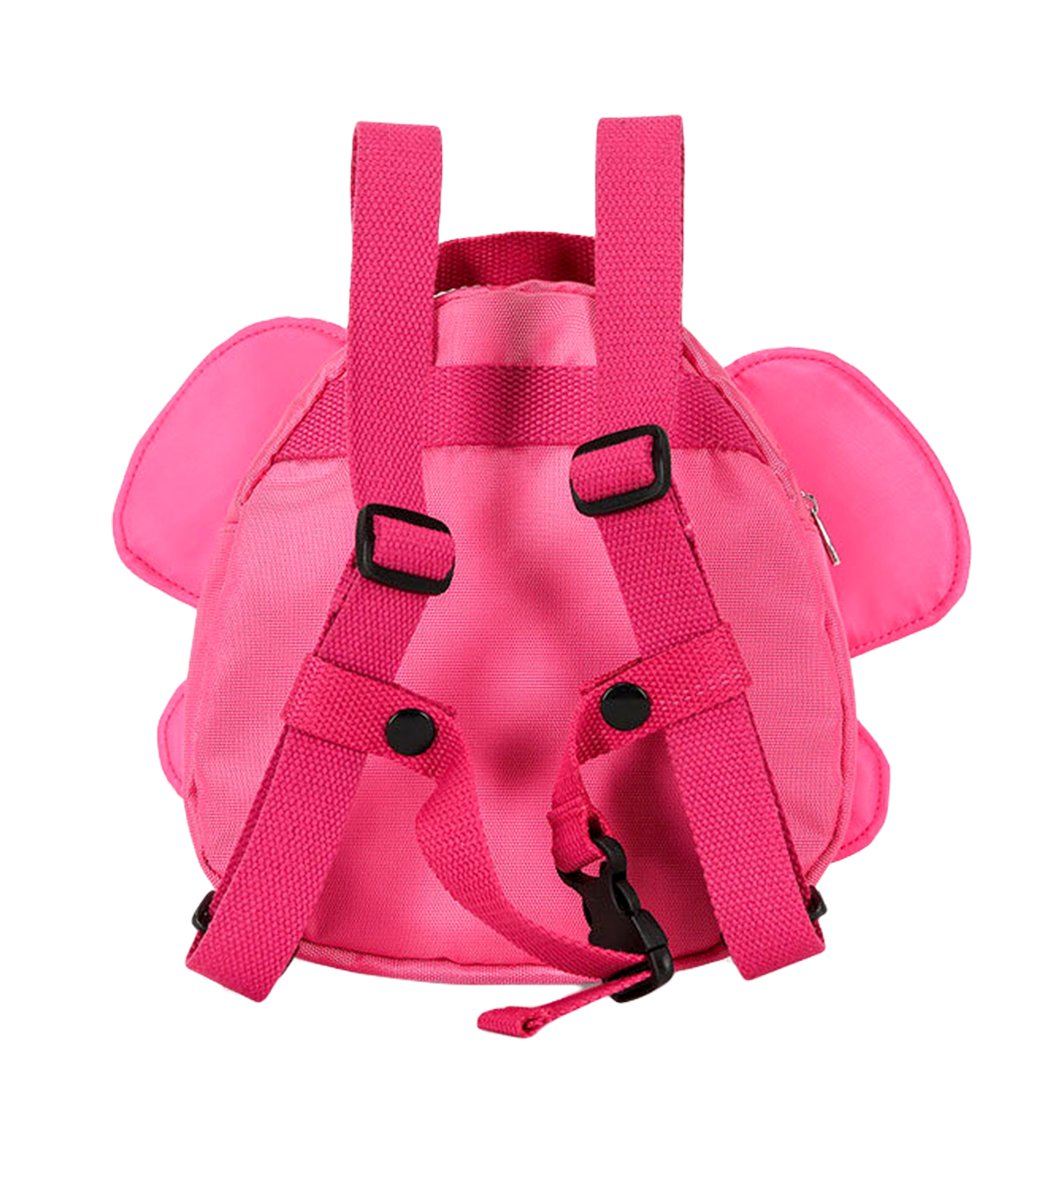 Xiaoyu beb/é mariposa con alas caminando arn/és de seguridad riendas ni/ño ni/ño mochila mochila bolsa rosa